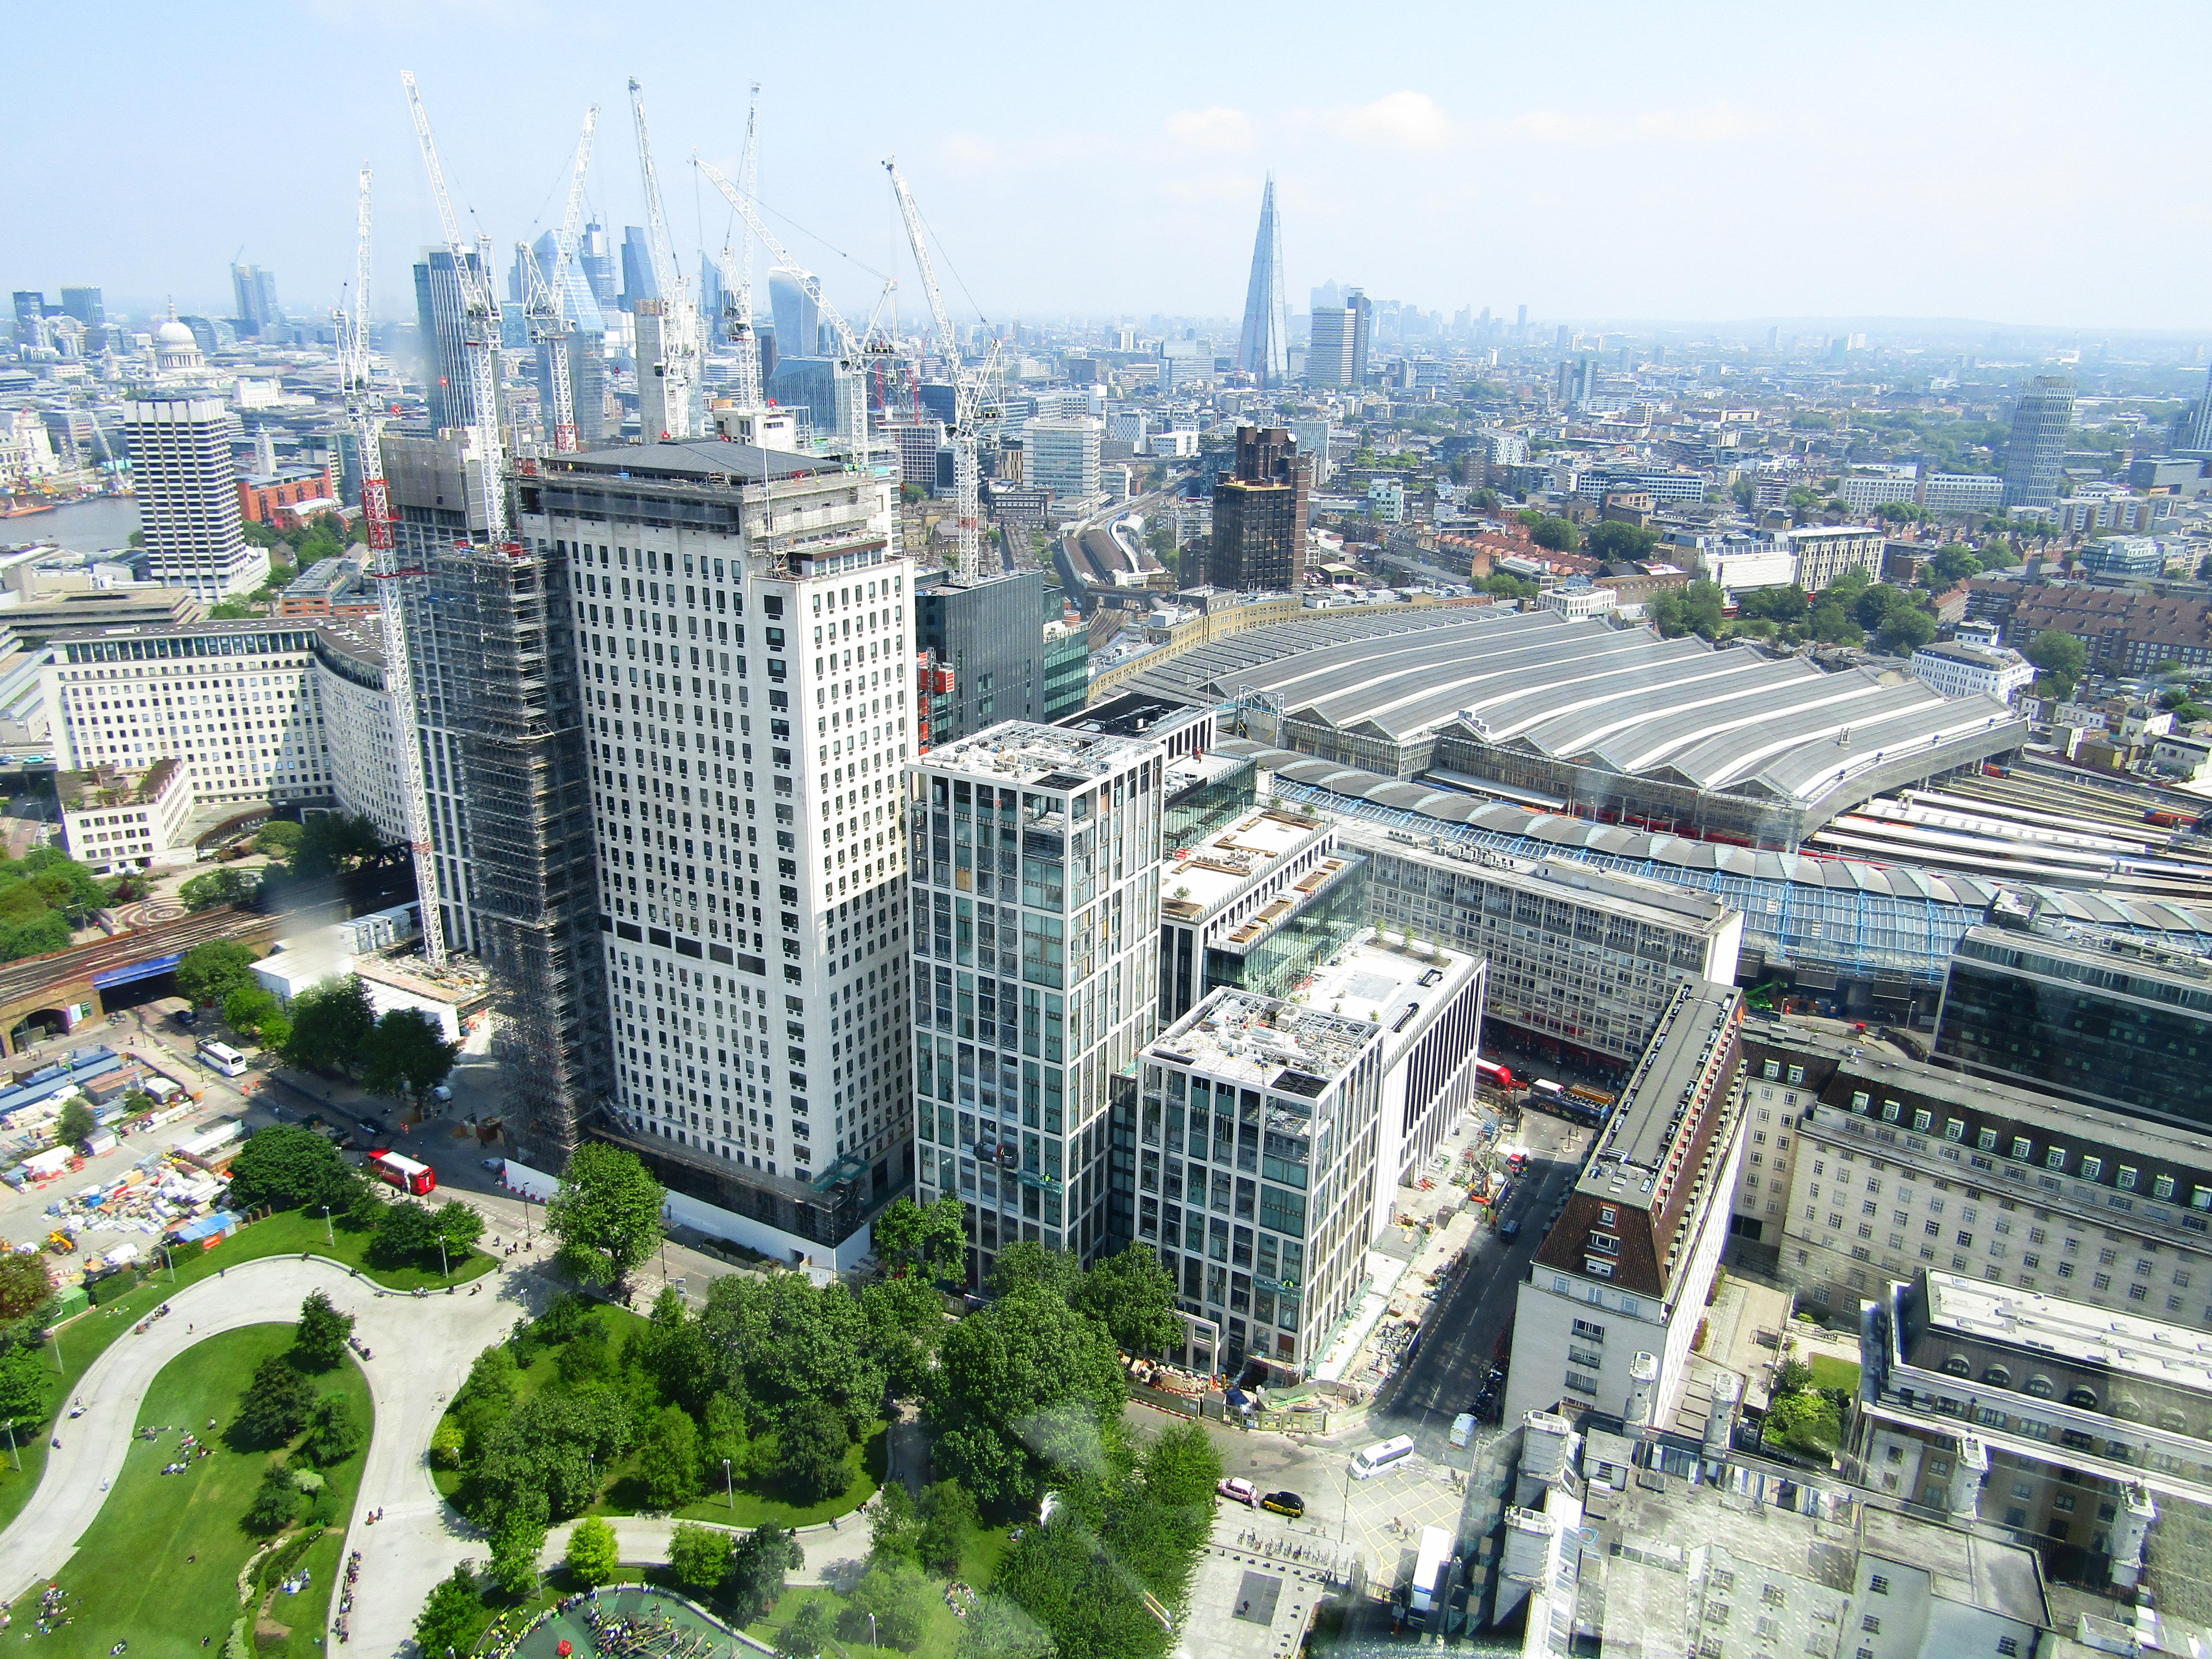 LONDON FOTOS 24 Mai 2018 (19)